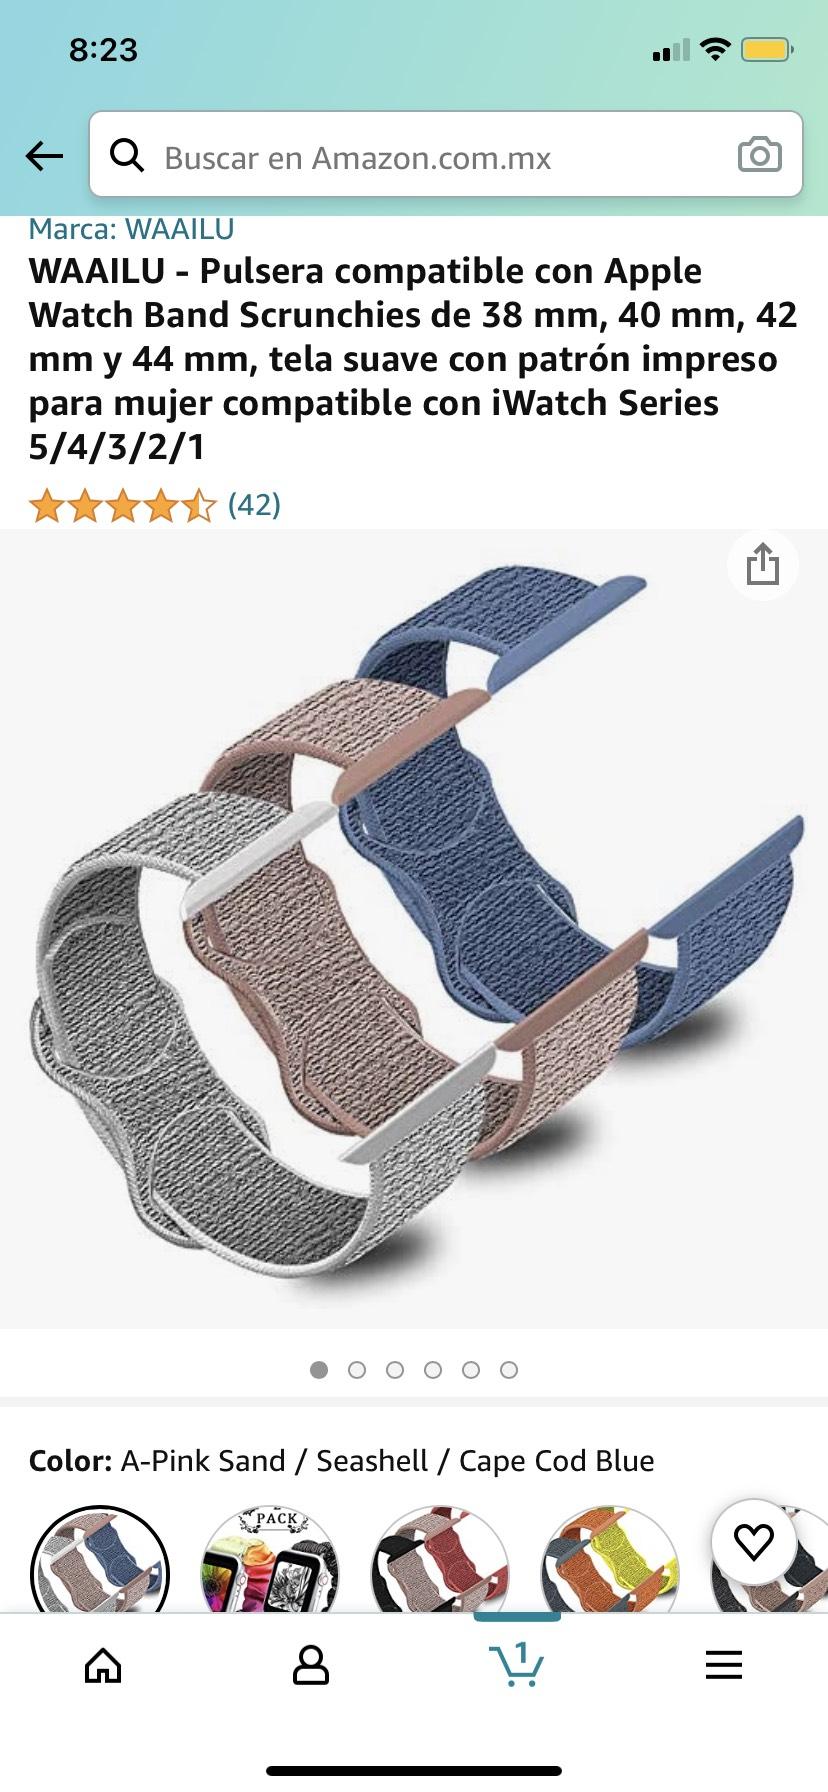 Amazon -WAAILU Pulsera compatible con Apple Watch Band Scrunchies